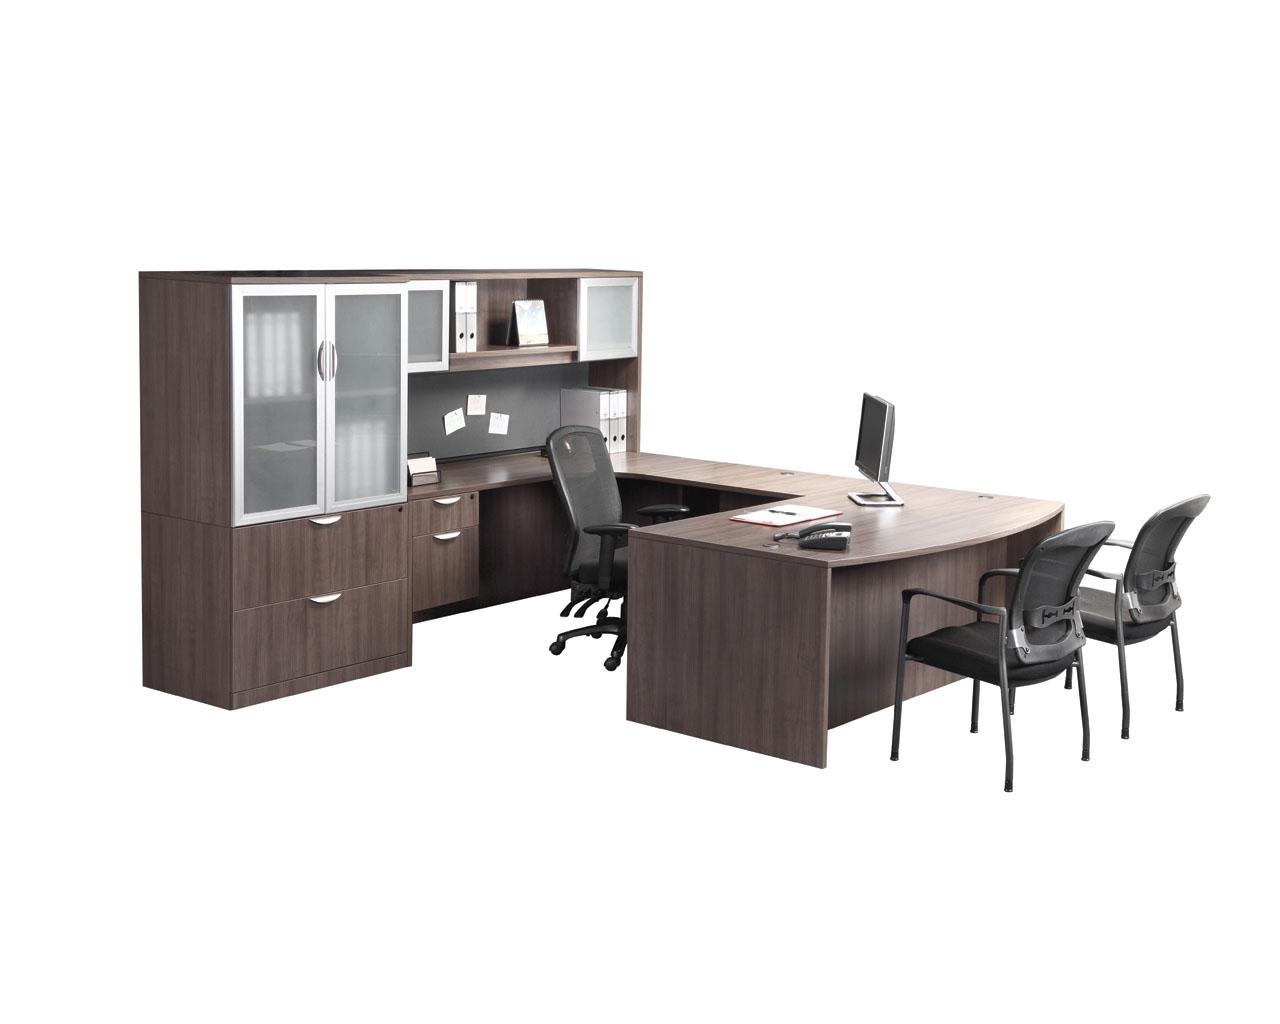 Classic 71 Executive Bowfront Desk with Radius Corner